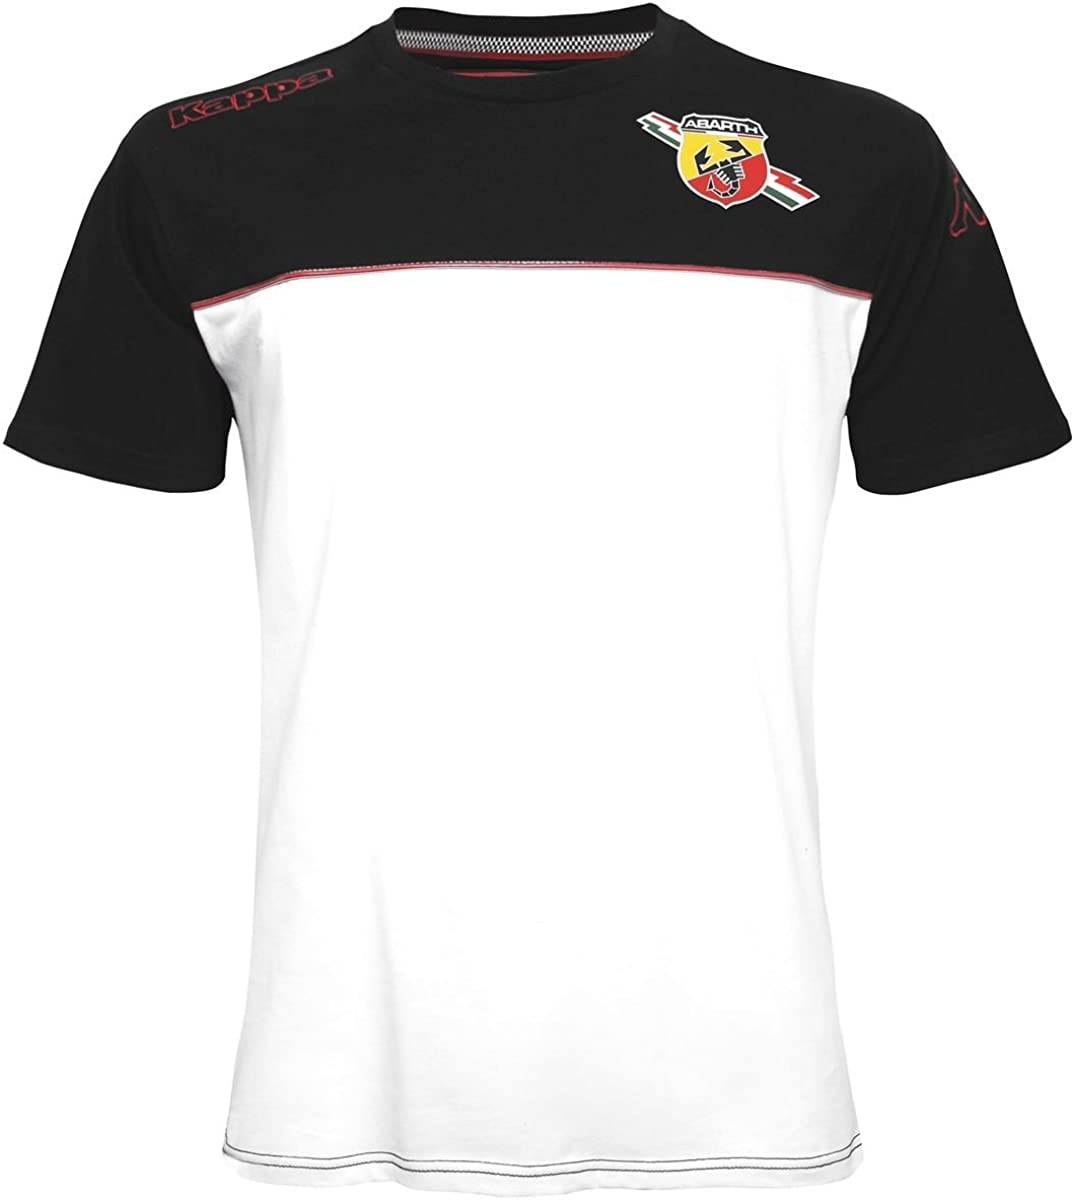 Kappa T-Shirt - Vauriony Abarth - White-Black - XS: Amazon.es ...